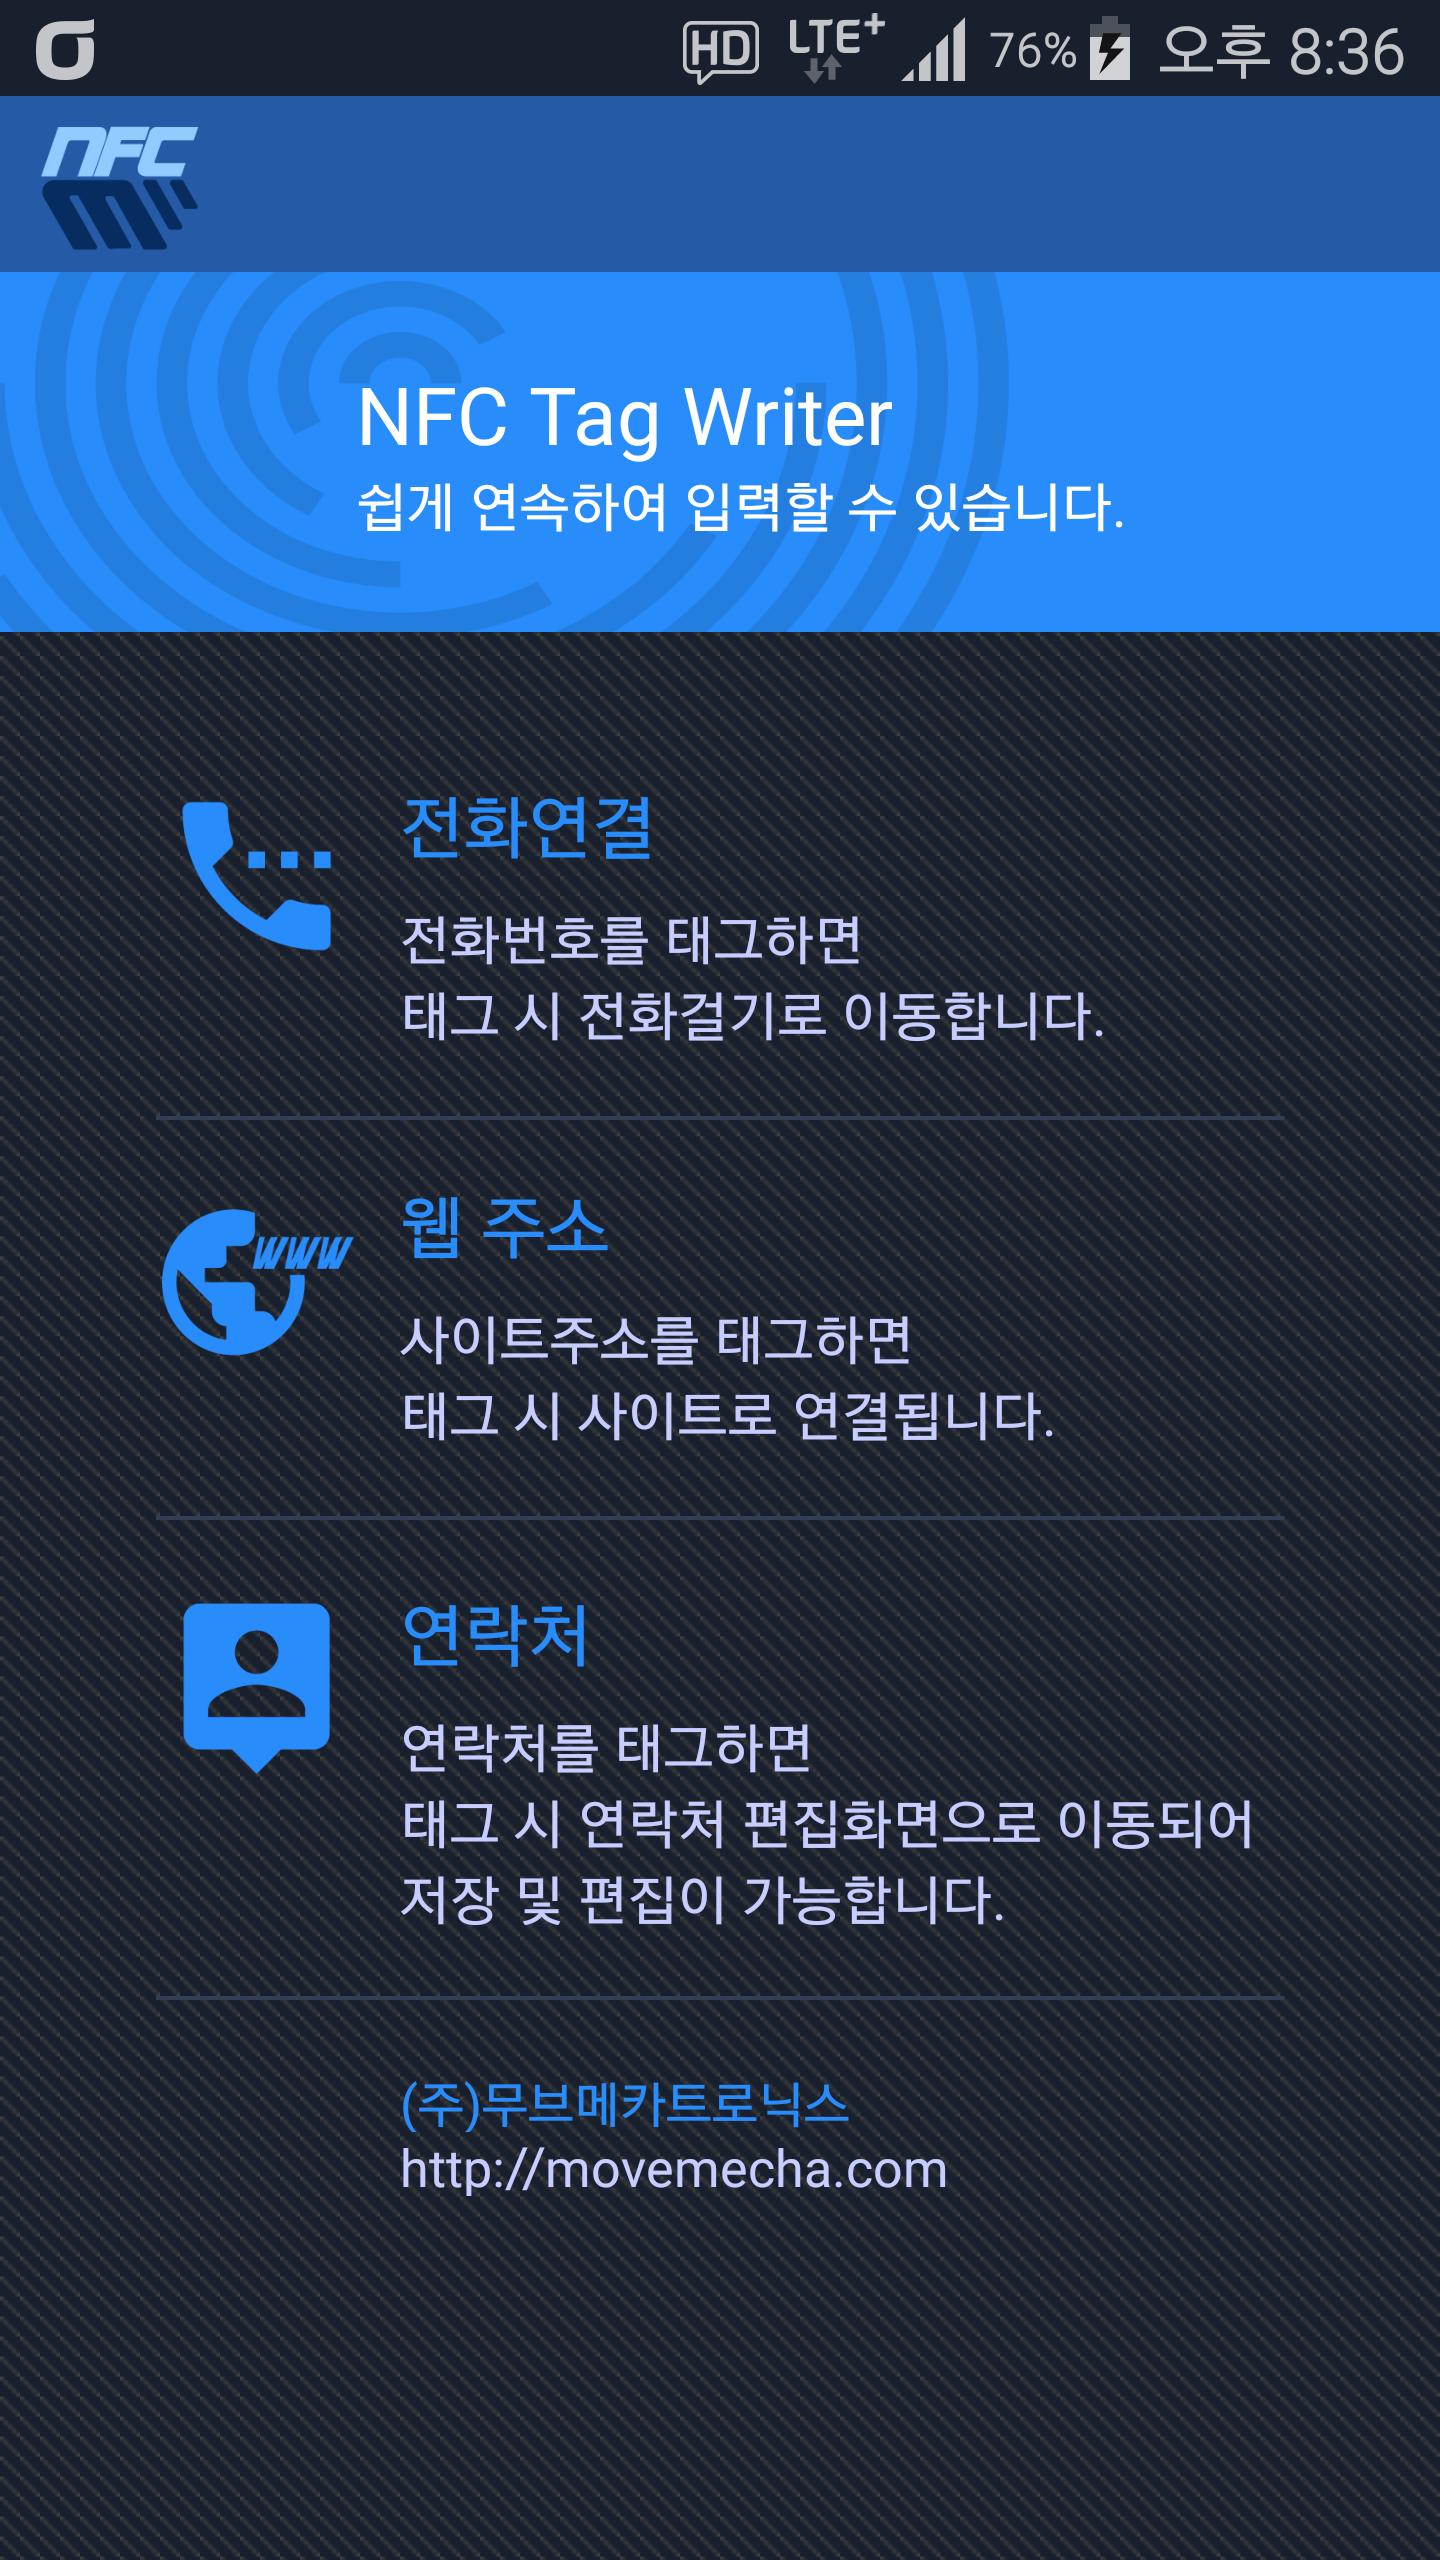 NFC Tag Writer